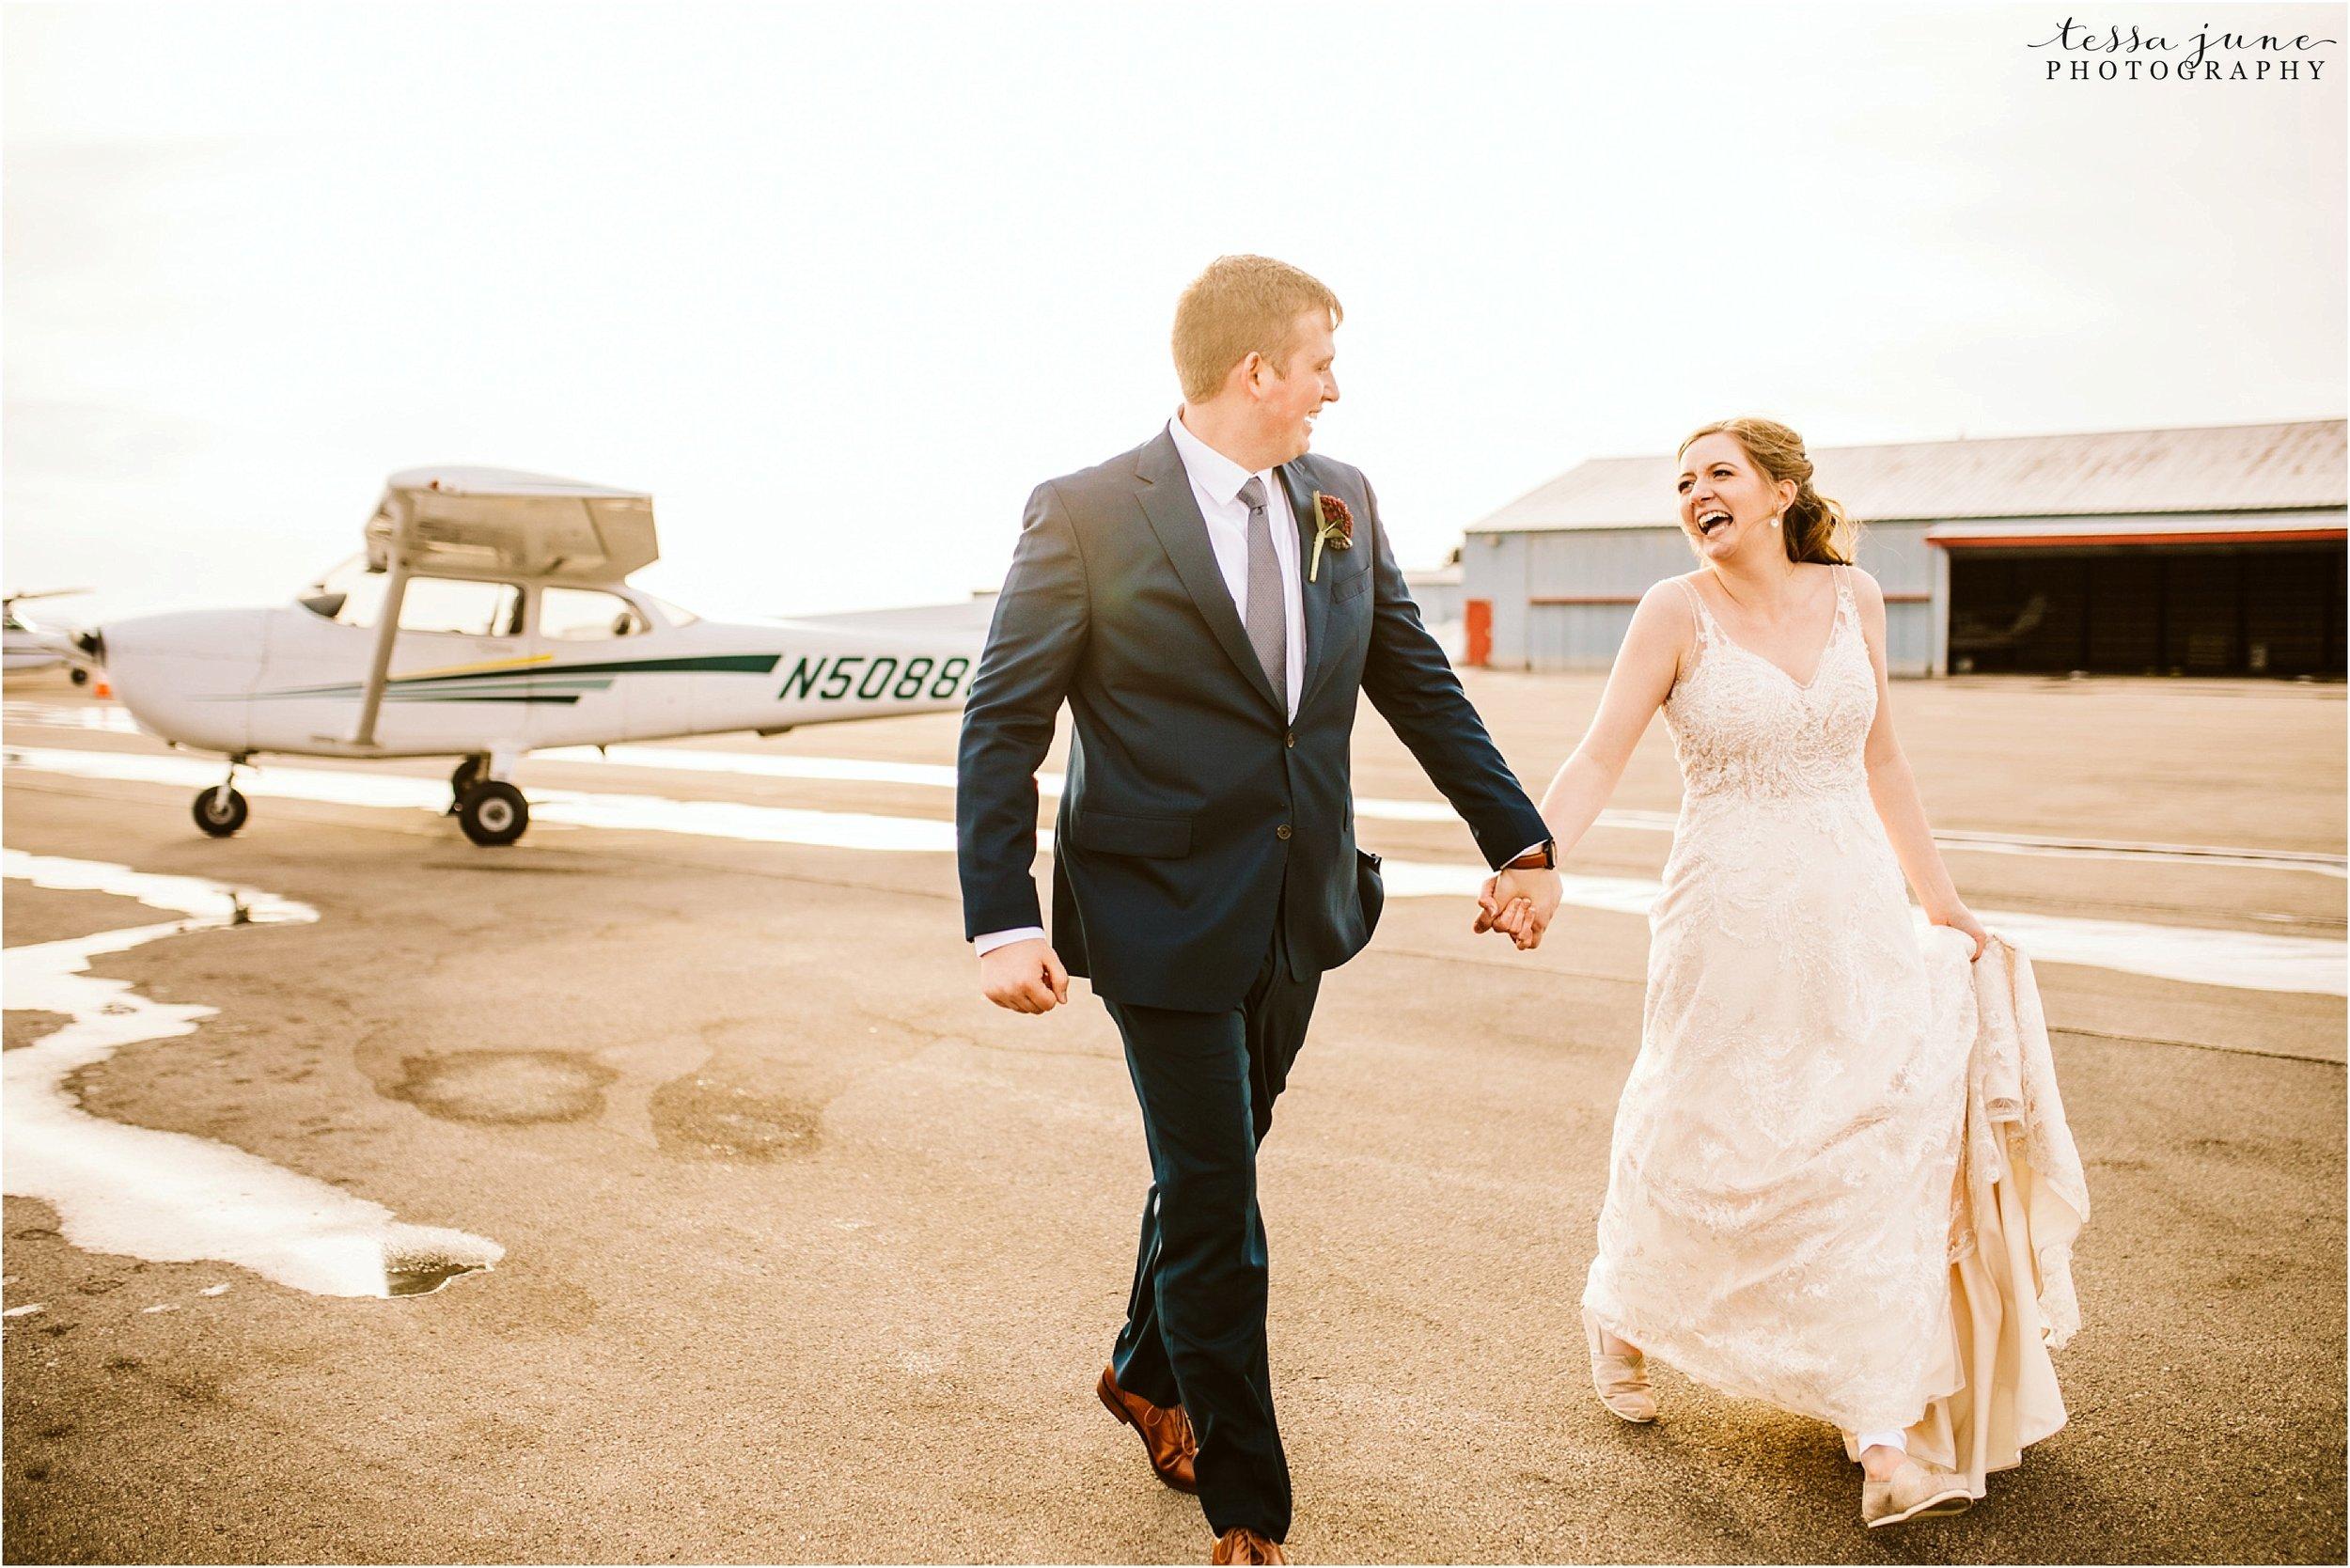 winter-wedding-in-eden-prairie-barn-minnesota-airplane-117.jpg